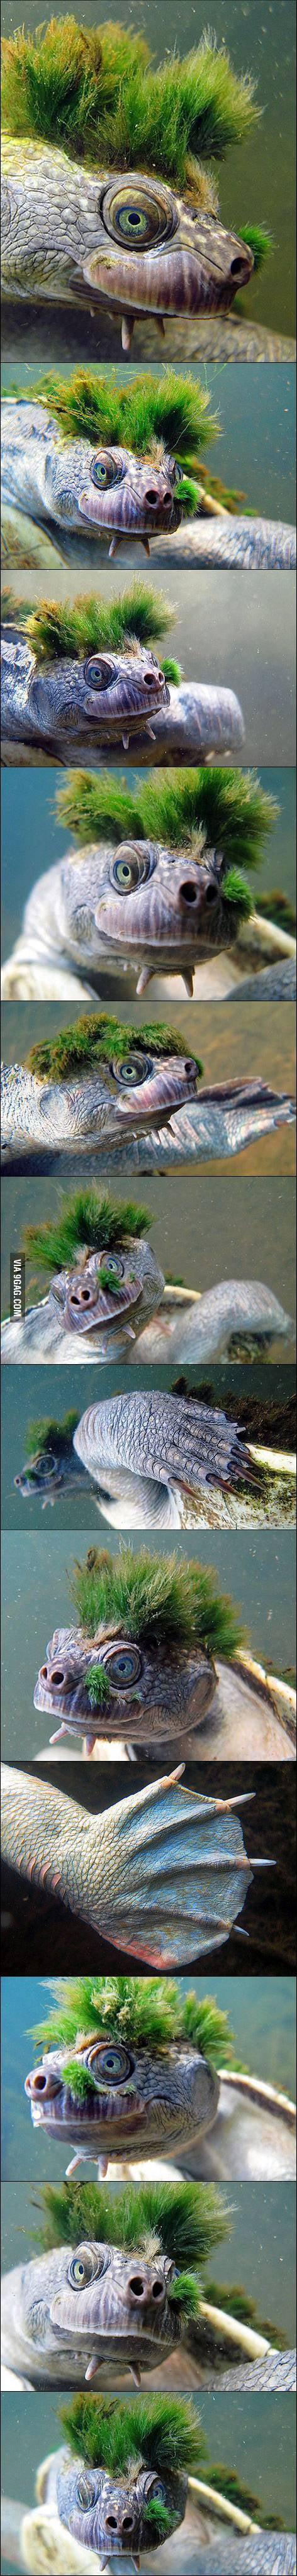 Moss Turtle